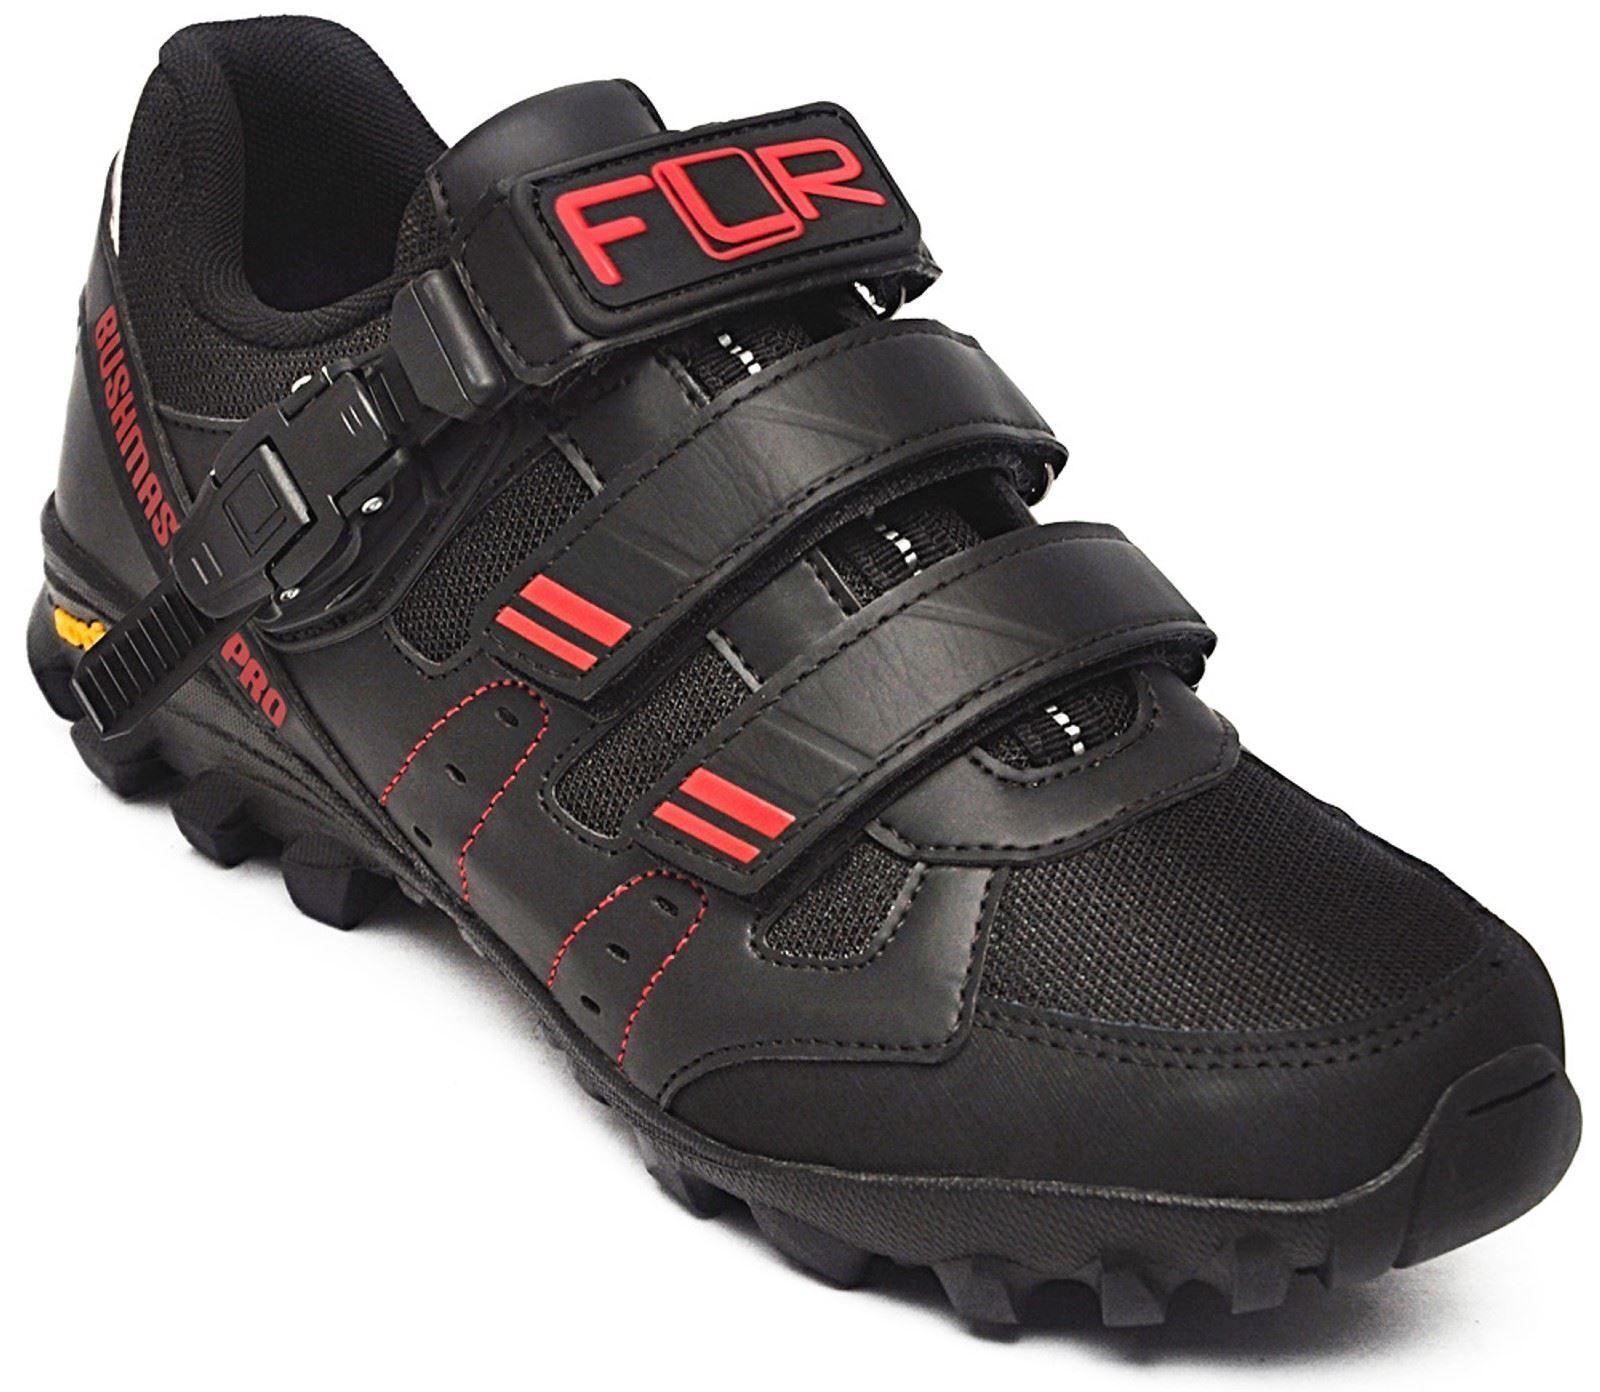 Flr Flr Flr Bushmaster pro MTB / Trial Zapato Negro/Hebilla de Plata & Cierre Talla 45 71bcd2